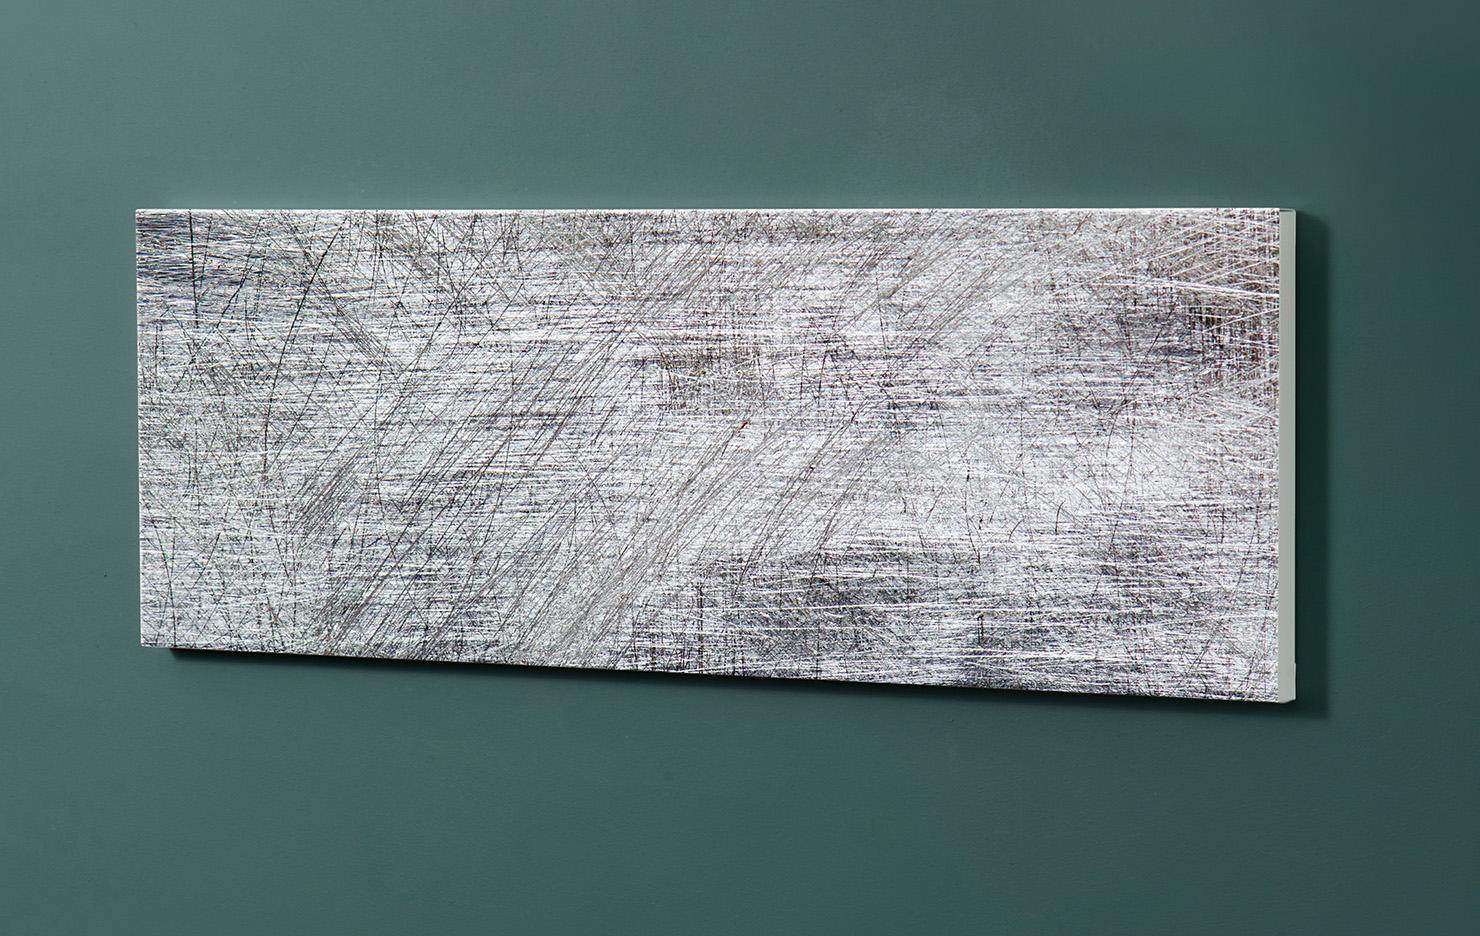 Magnettafel NOTIZ 90x30cm Motiv-Pinnwand M134 Abstrakt Kunst